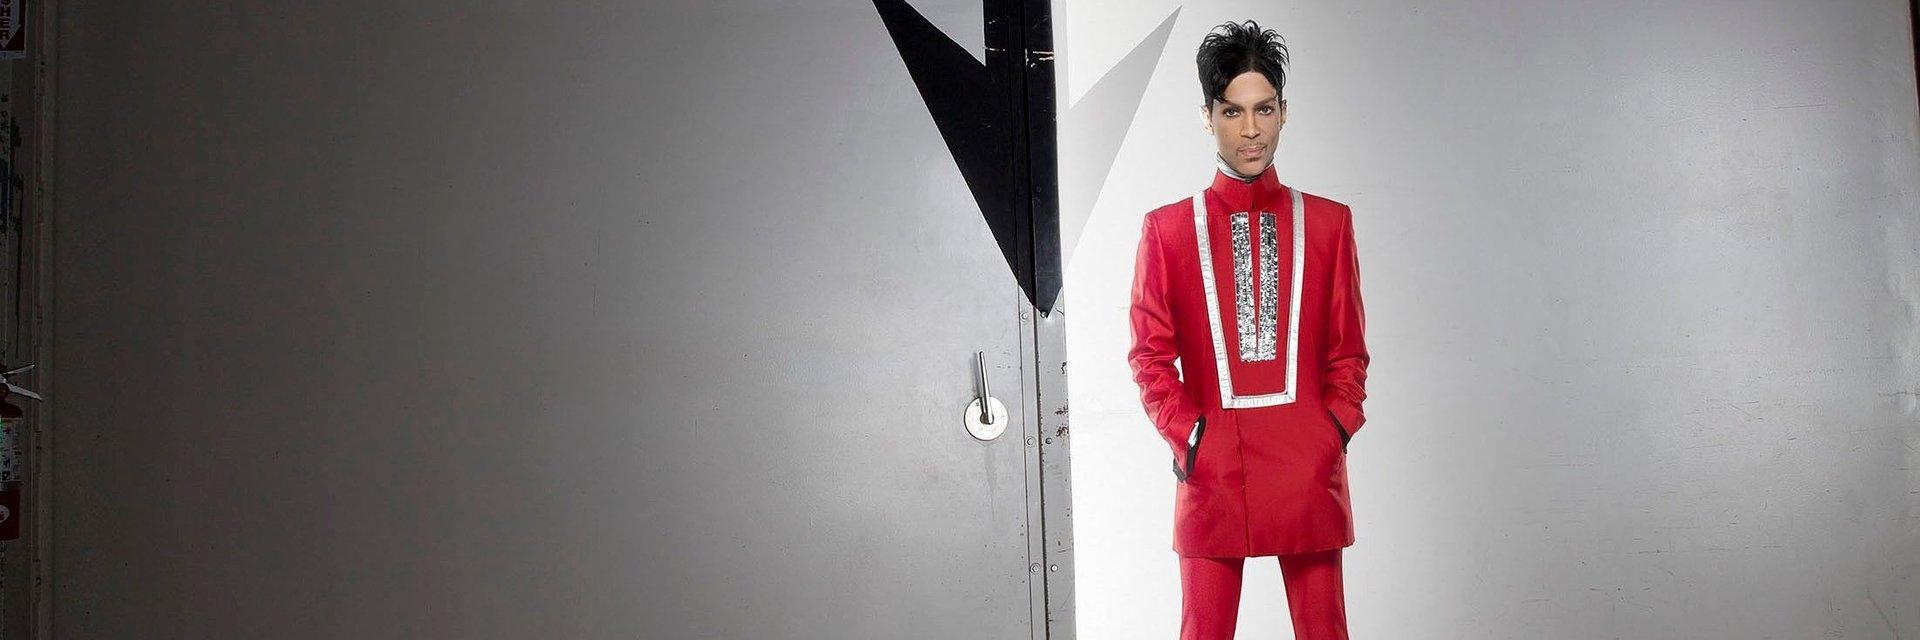 "Premiera nowego albumu Prince'a""Welcome 2 America"""